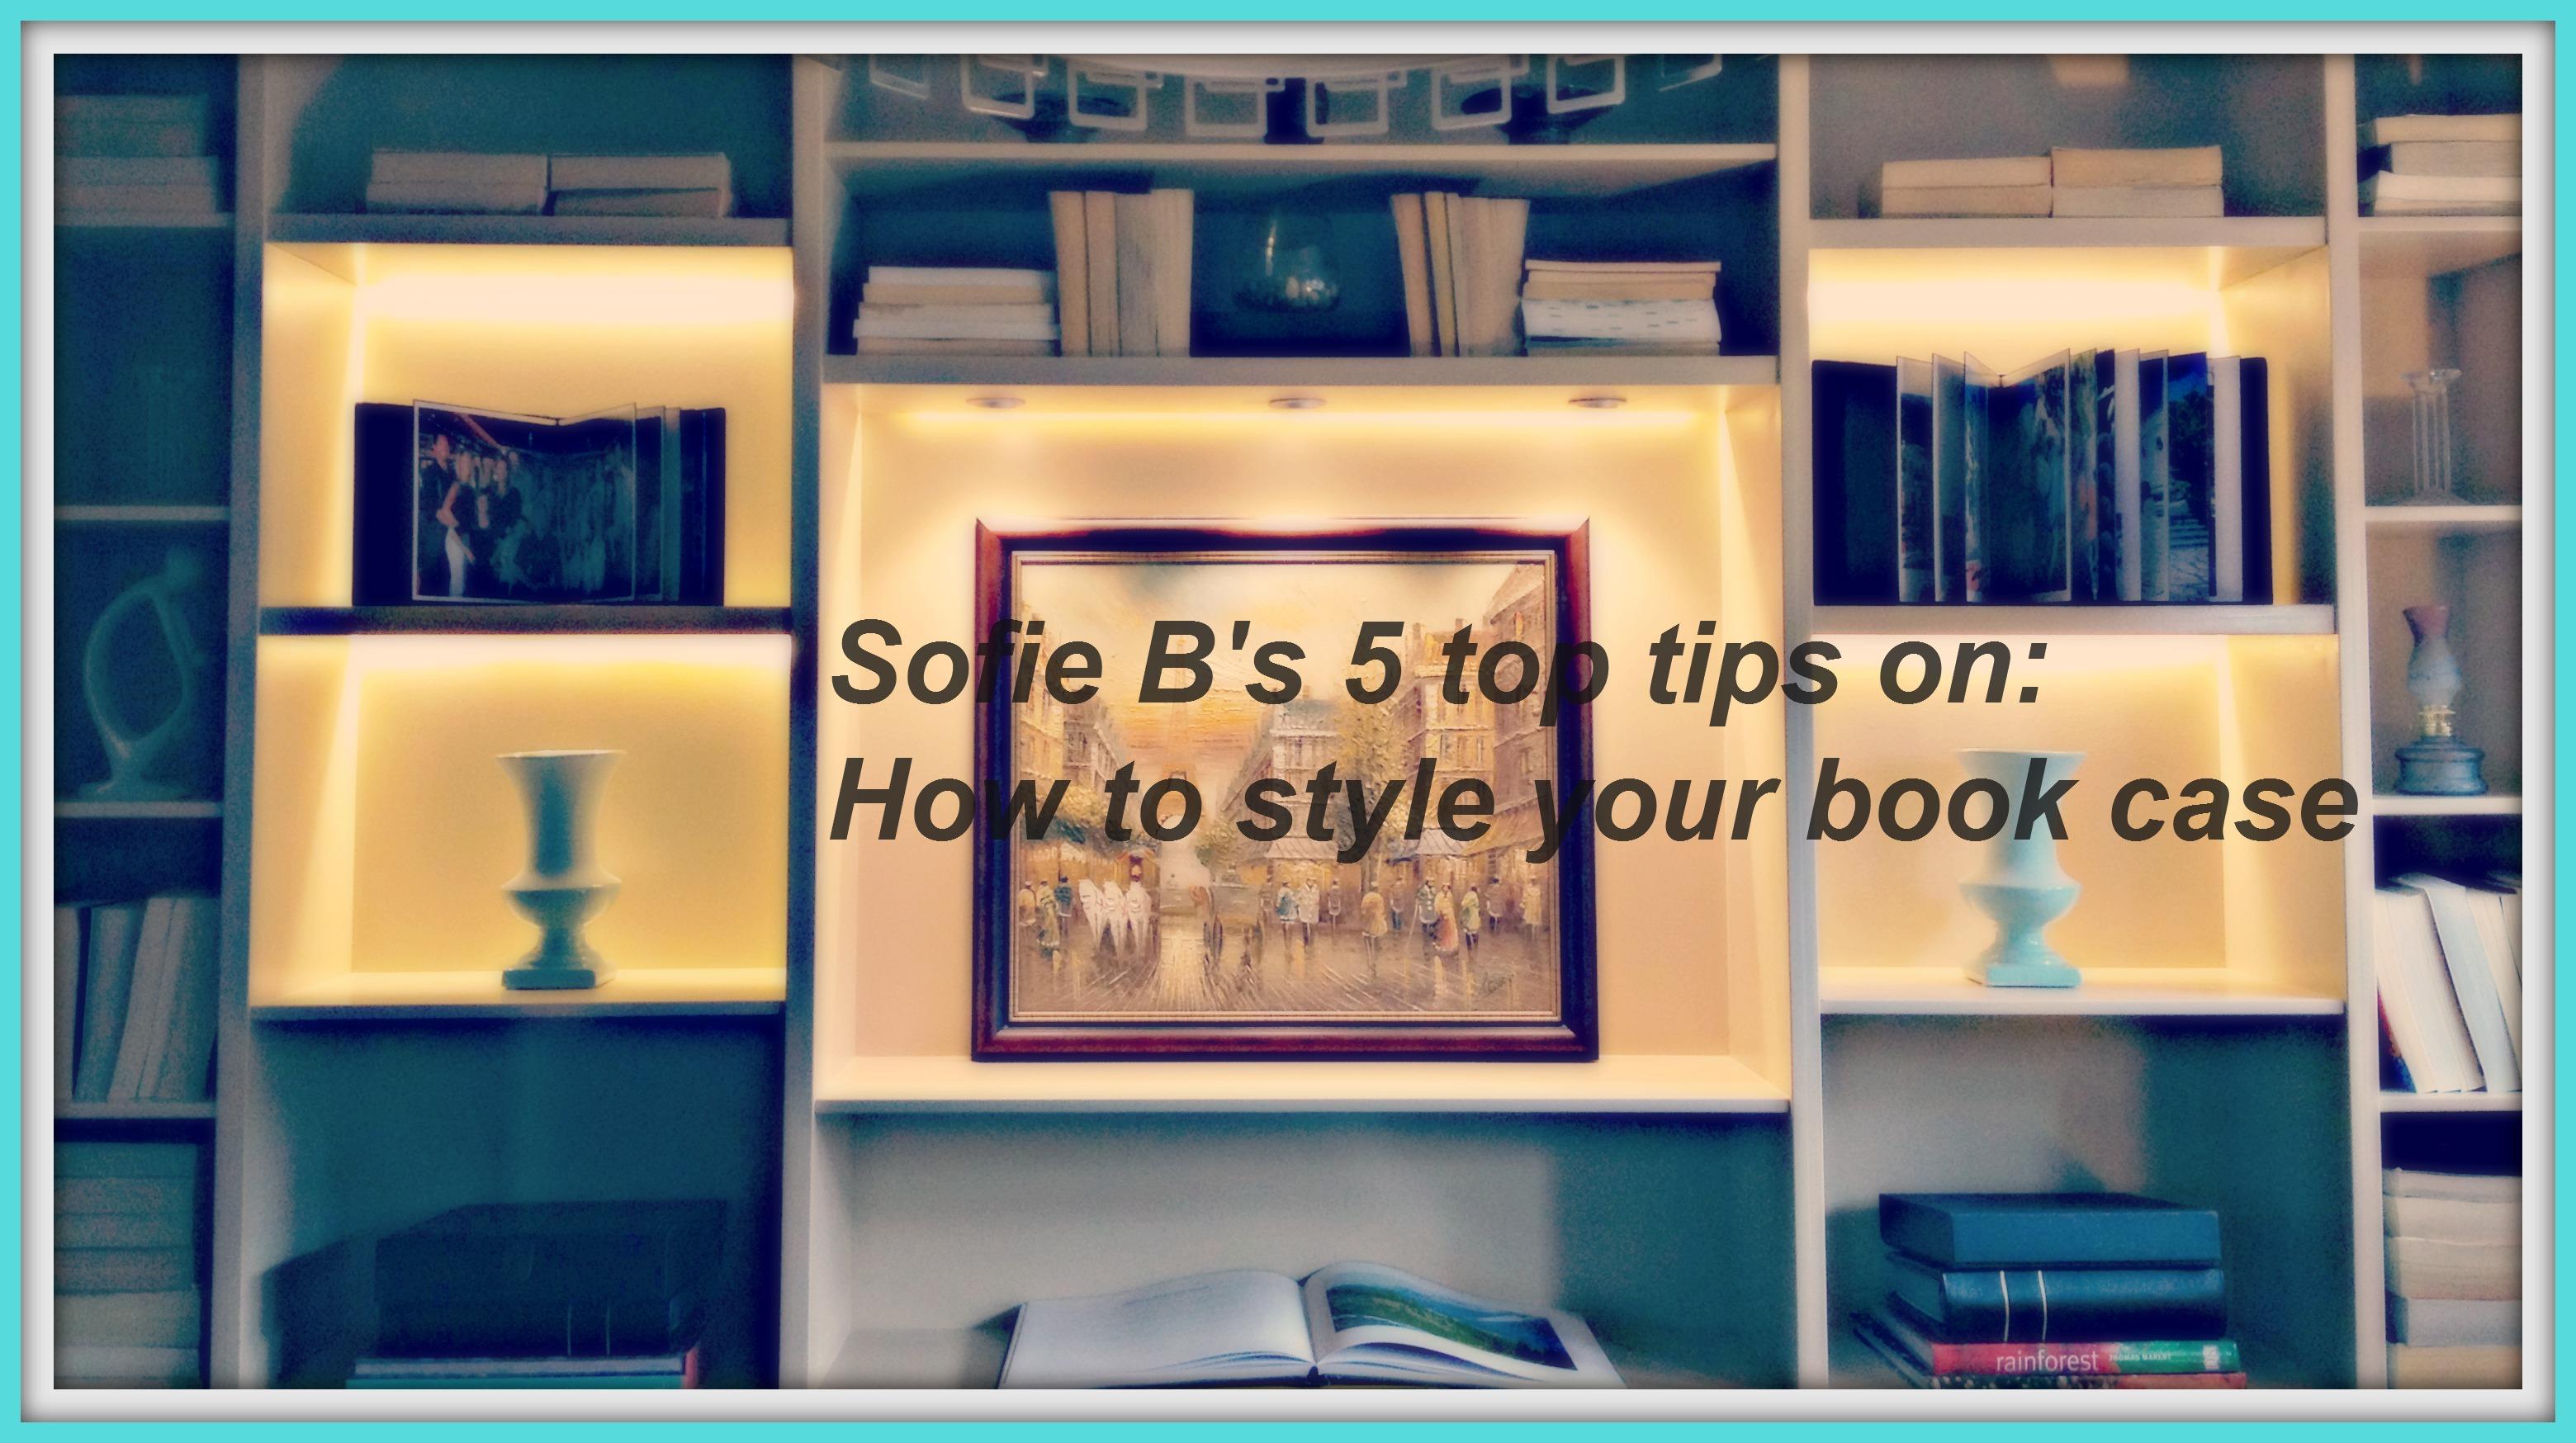 Top tips bookshelf header